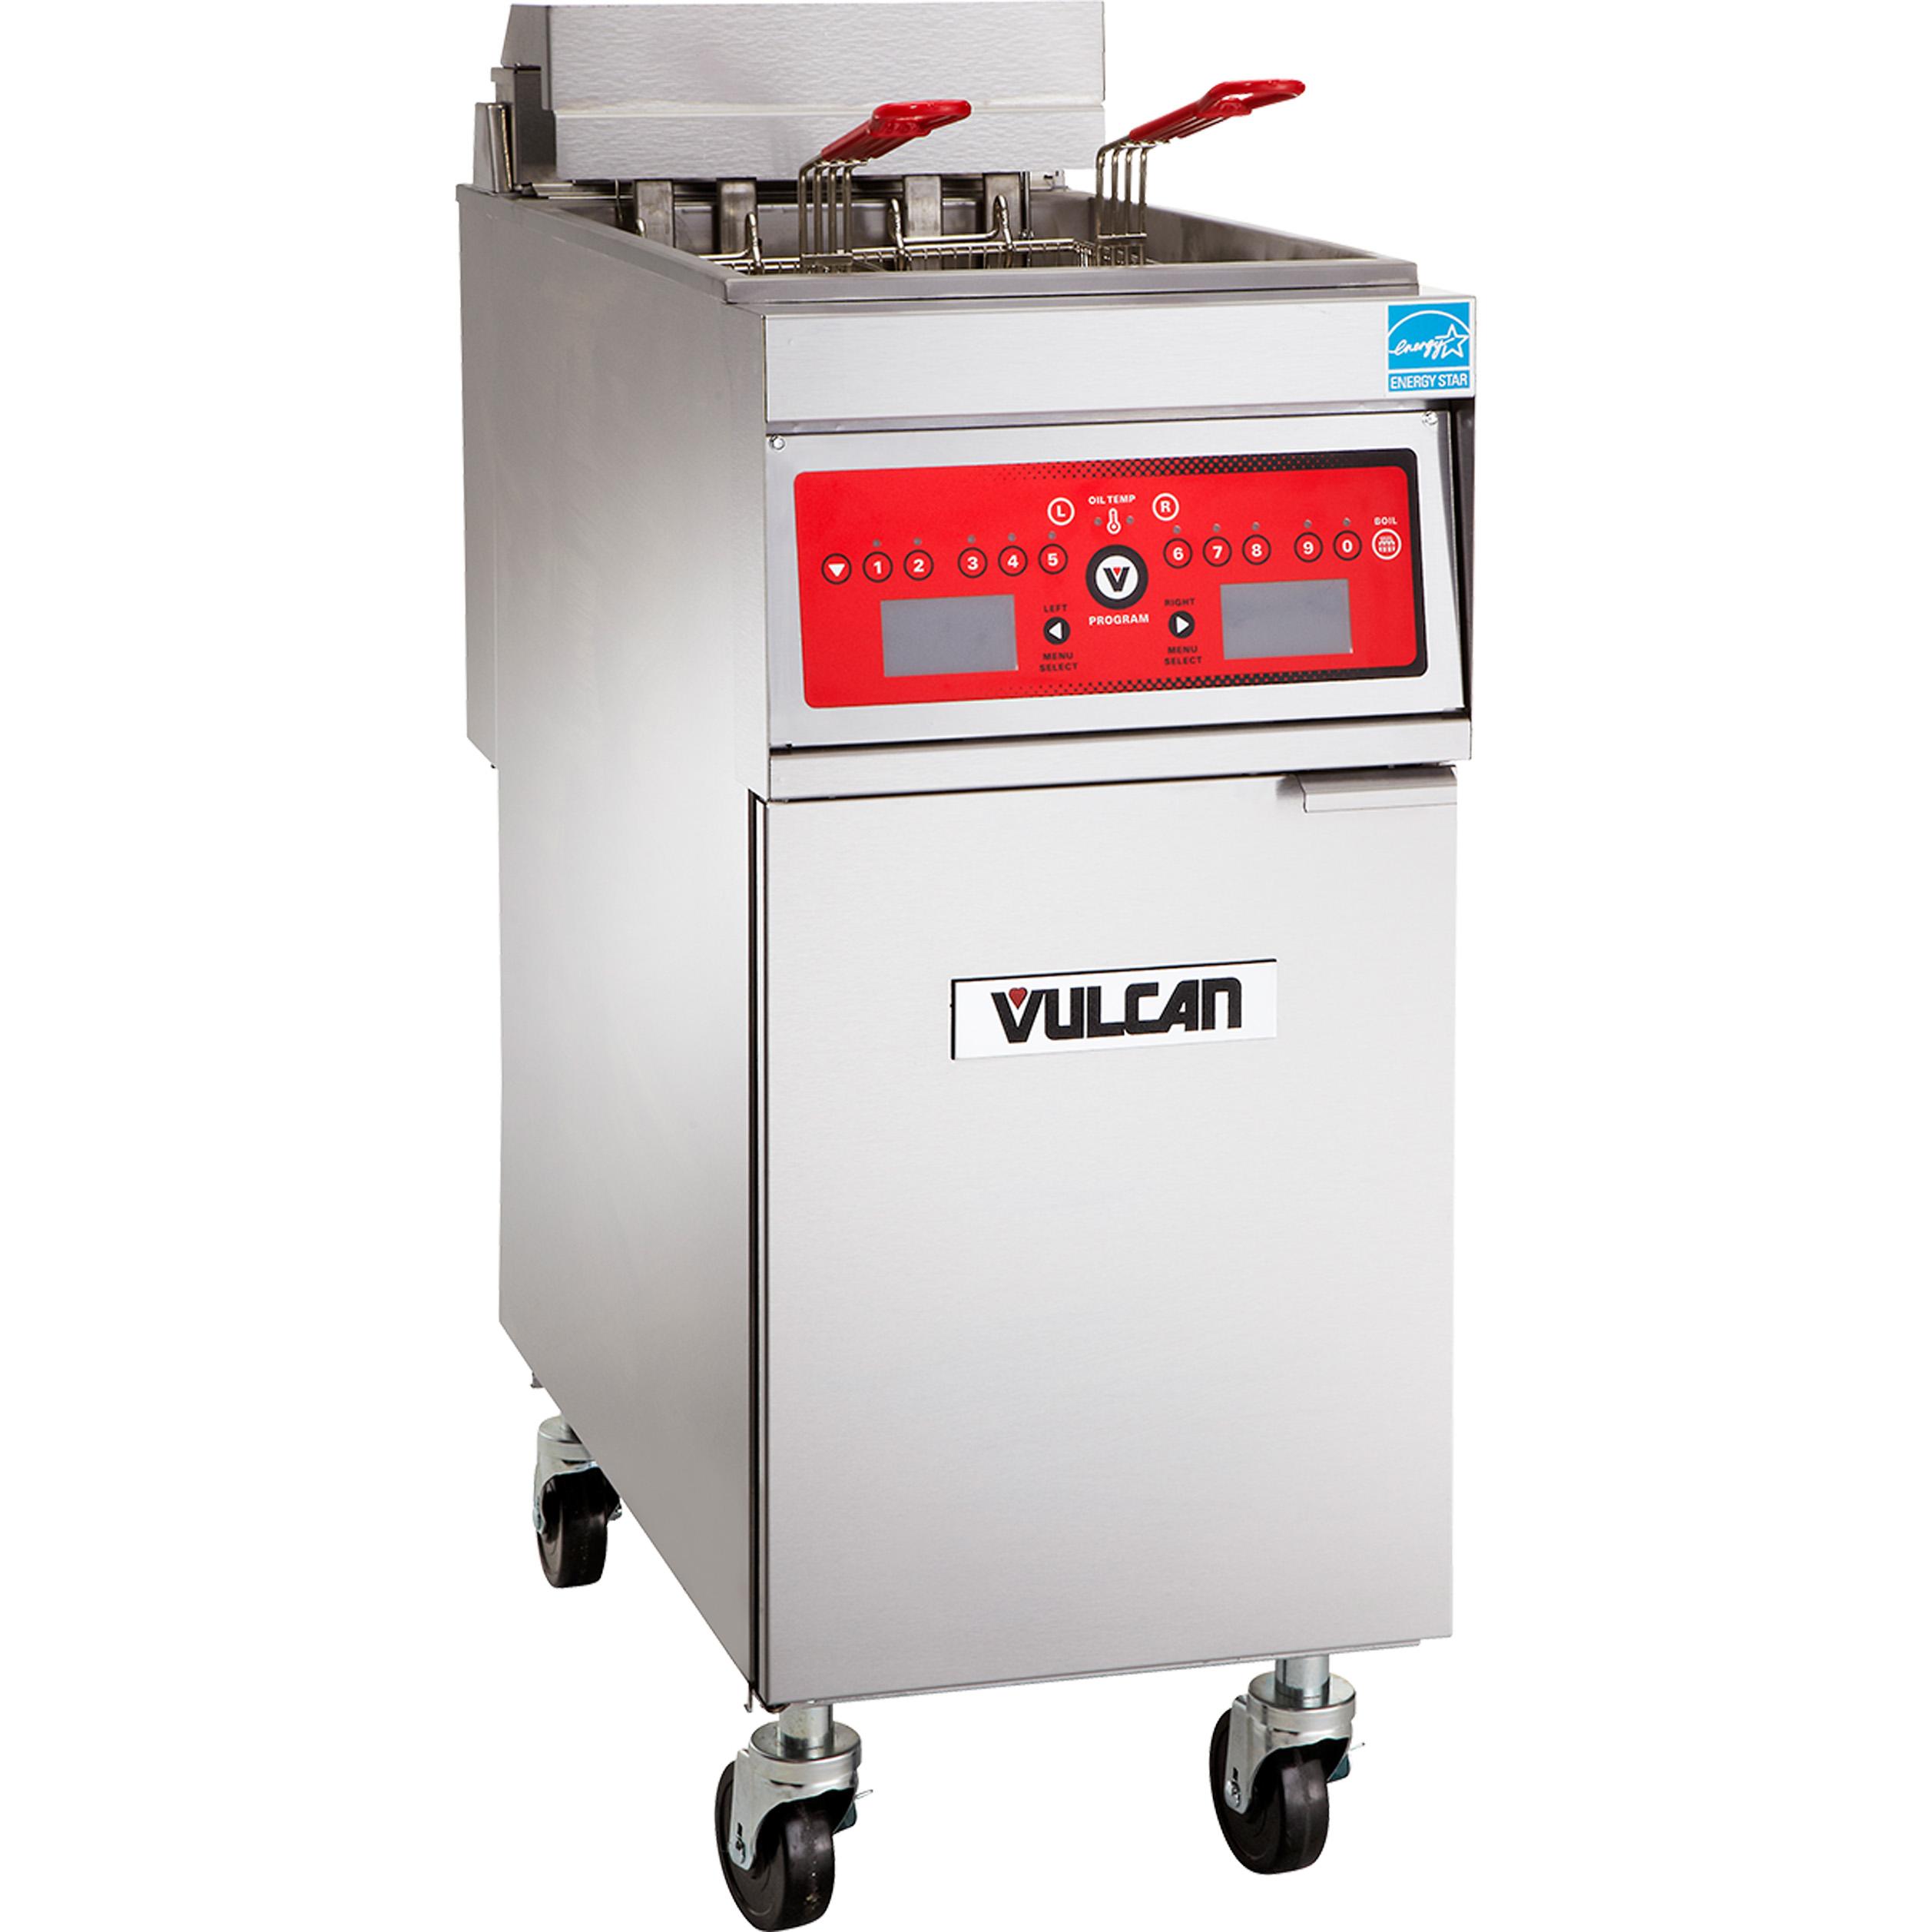 Vulcan 1ER50C fryer, electric, floor model, full pot